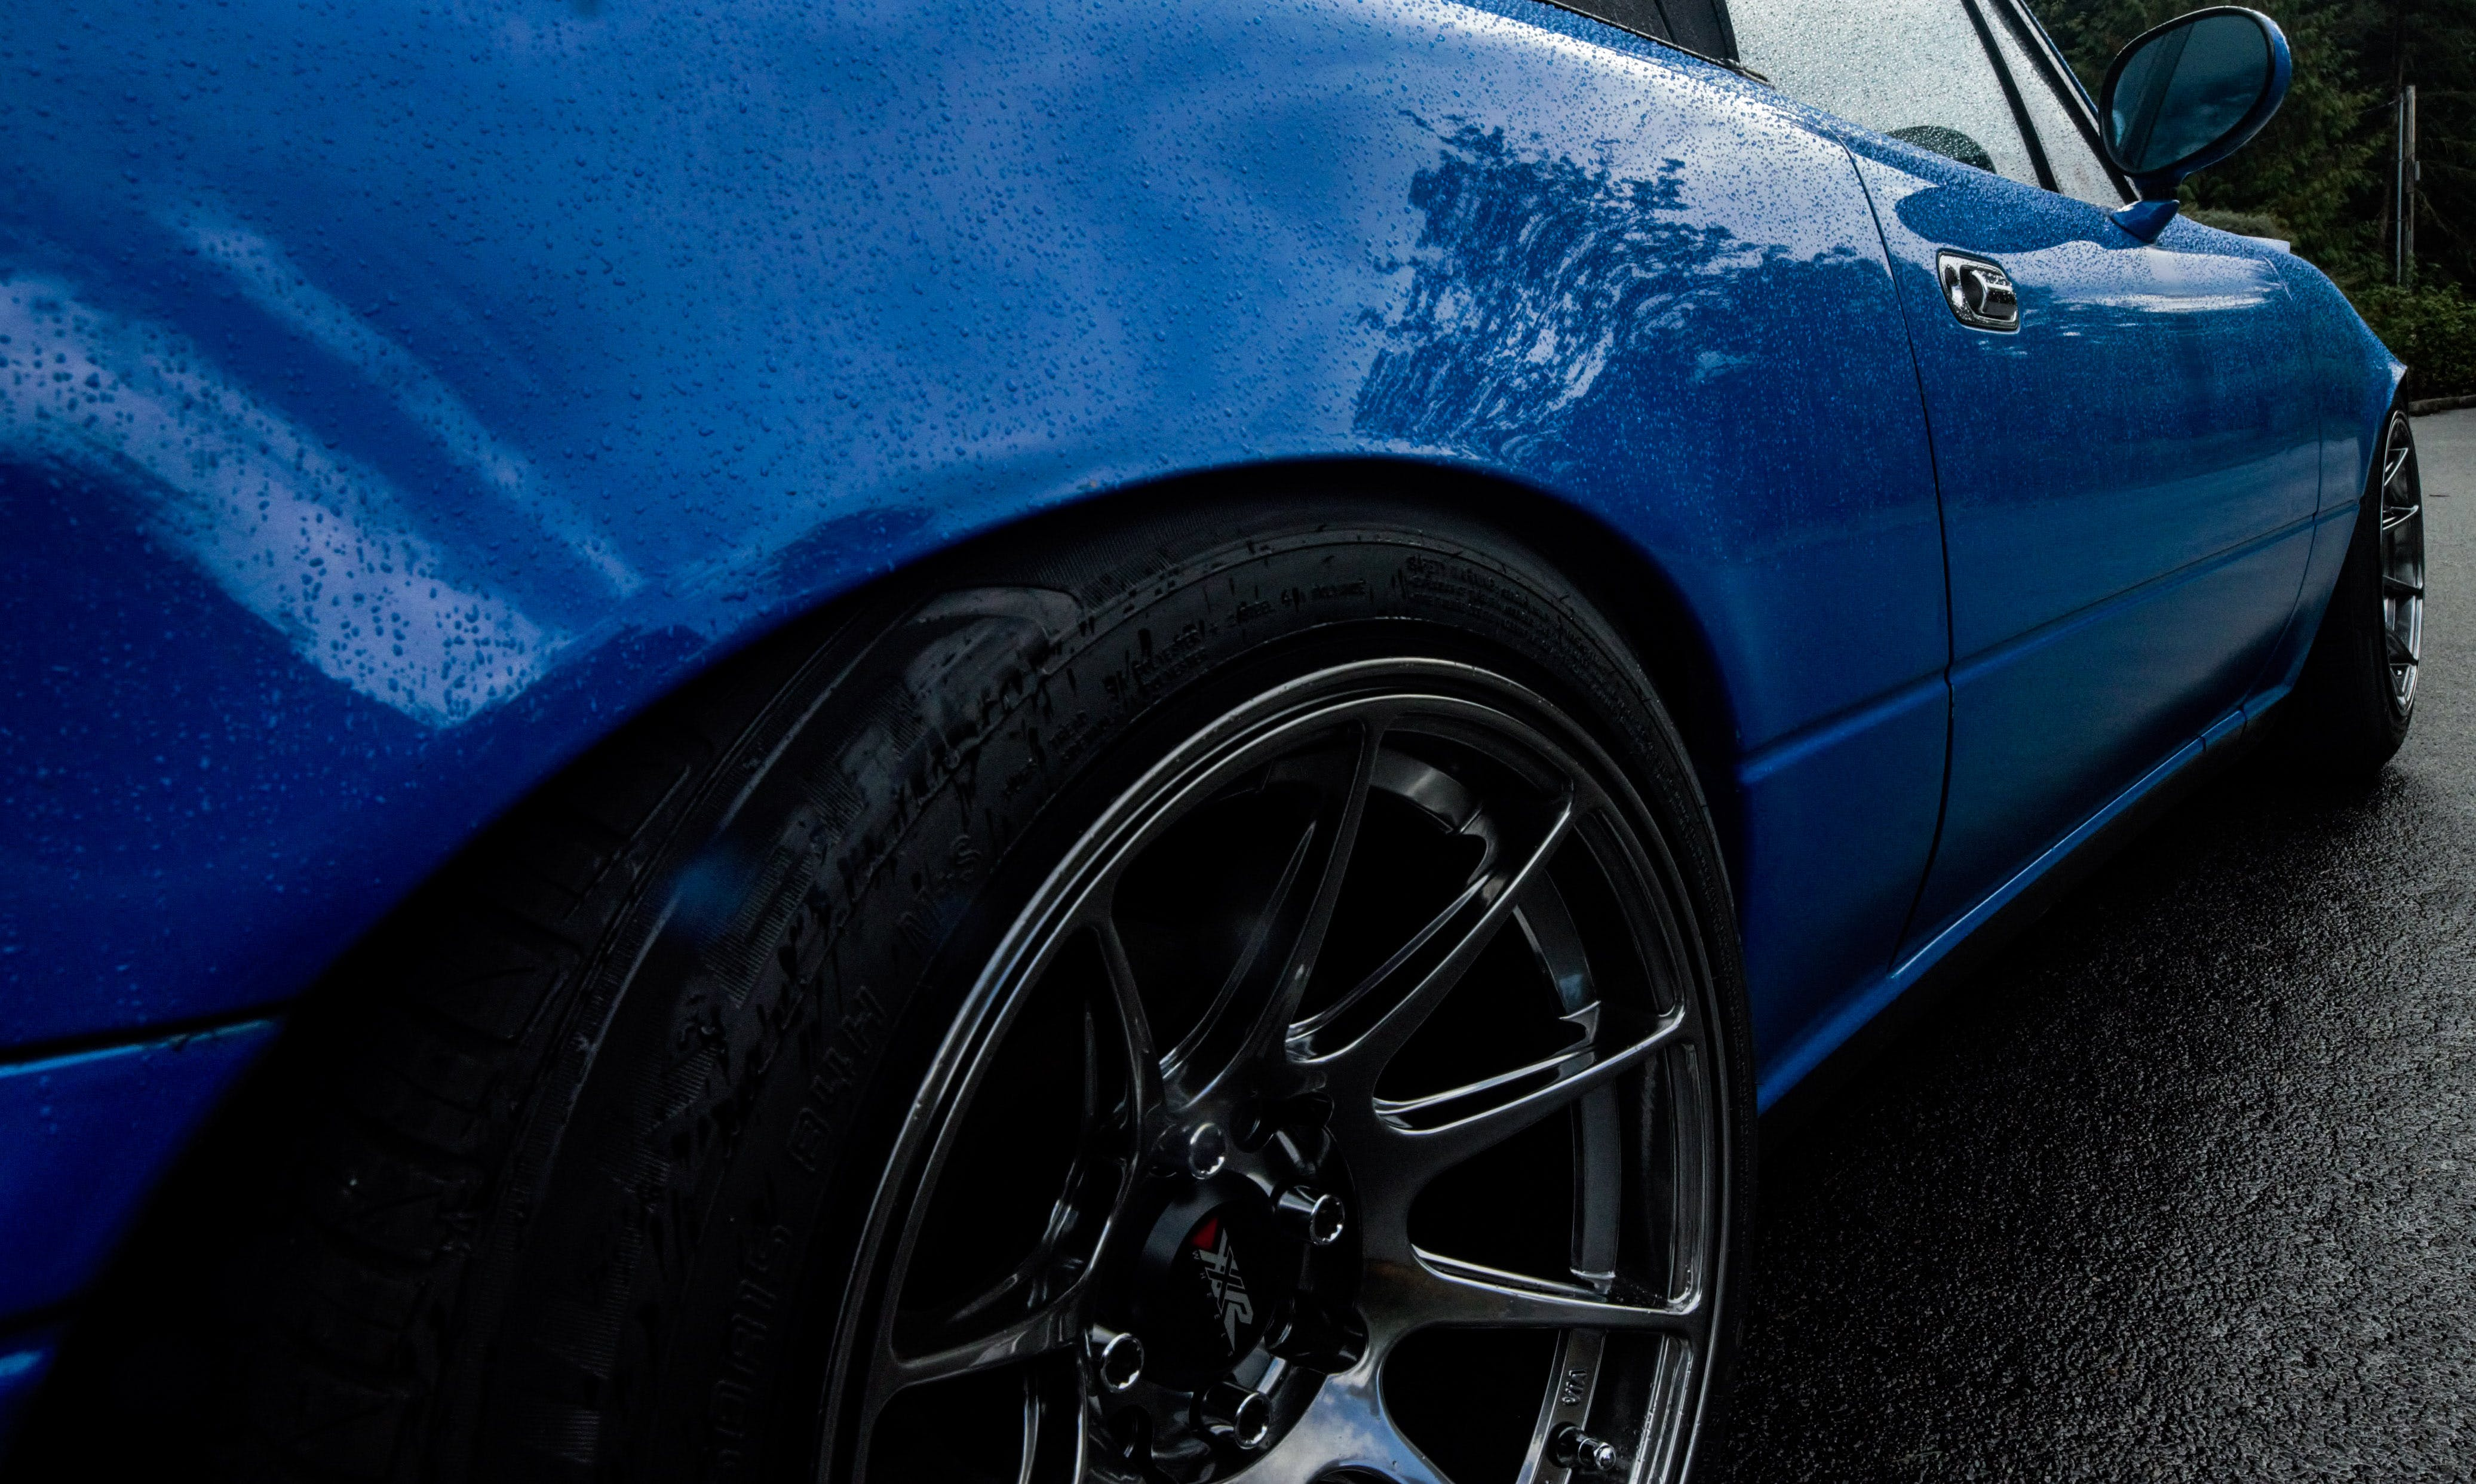 Free stock photo of blue, car, cars, closeup